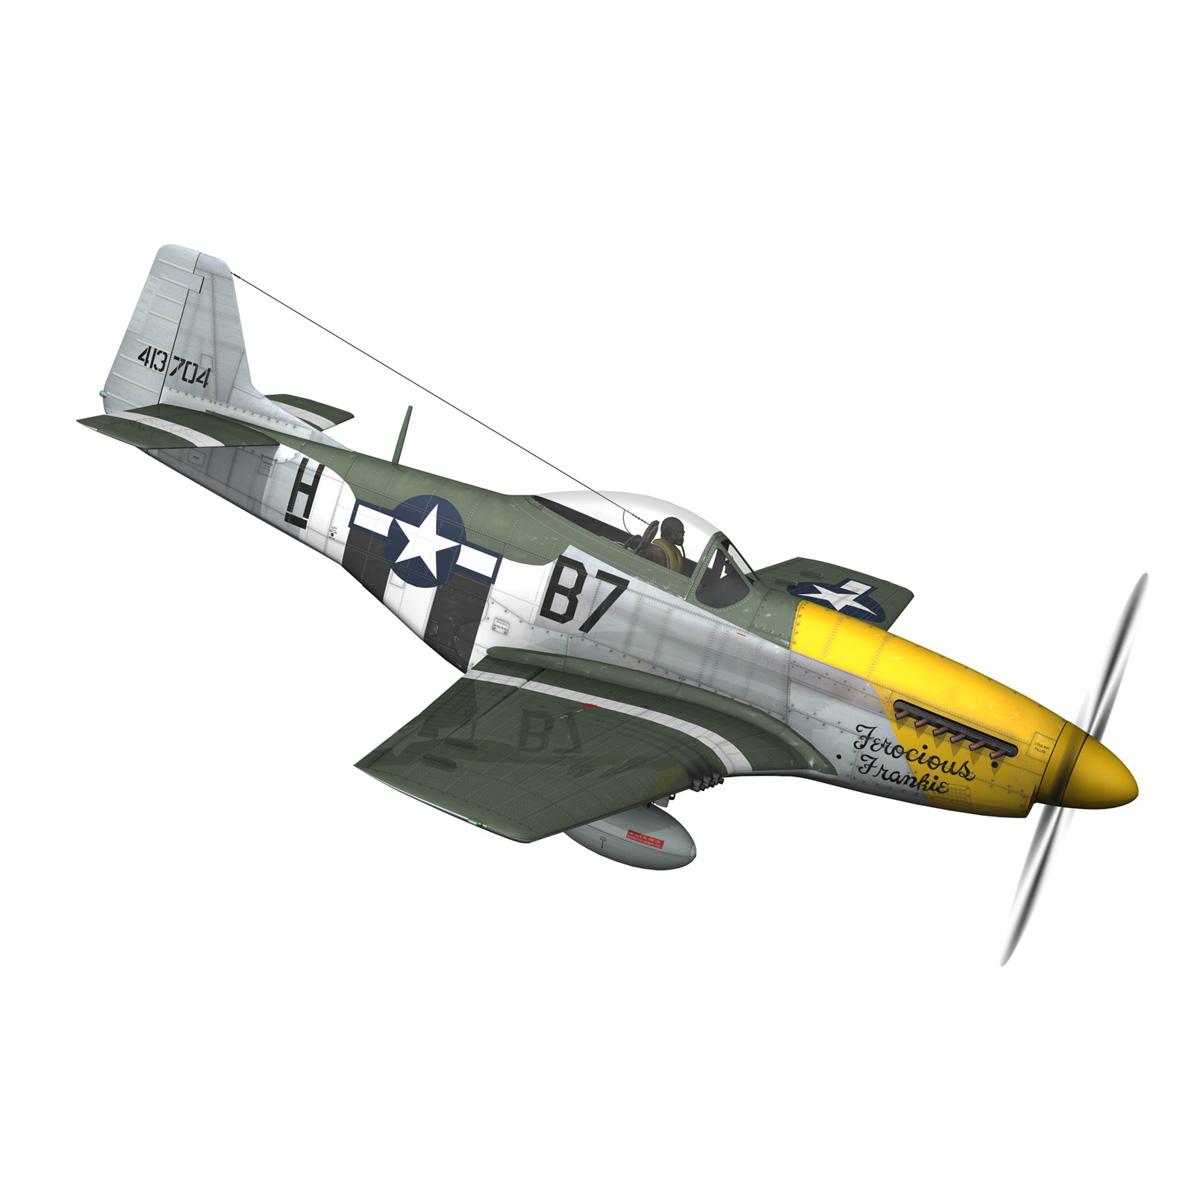 north american p-51d mustang – ferocious frankie 3d model fbx c4d lwo obj 269492